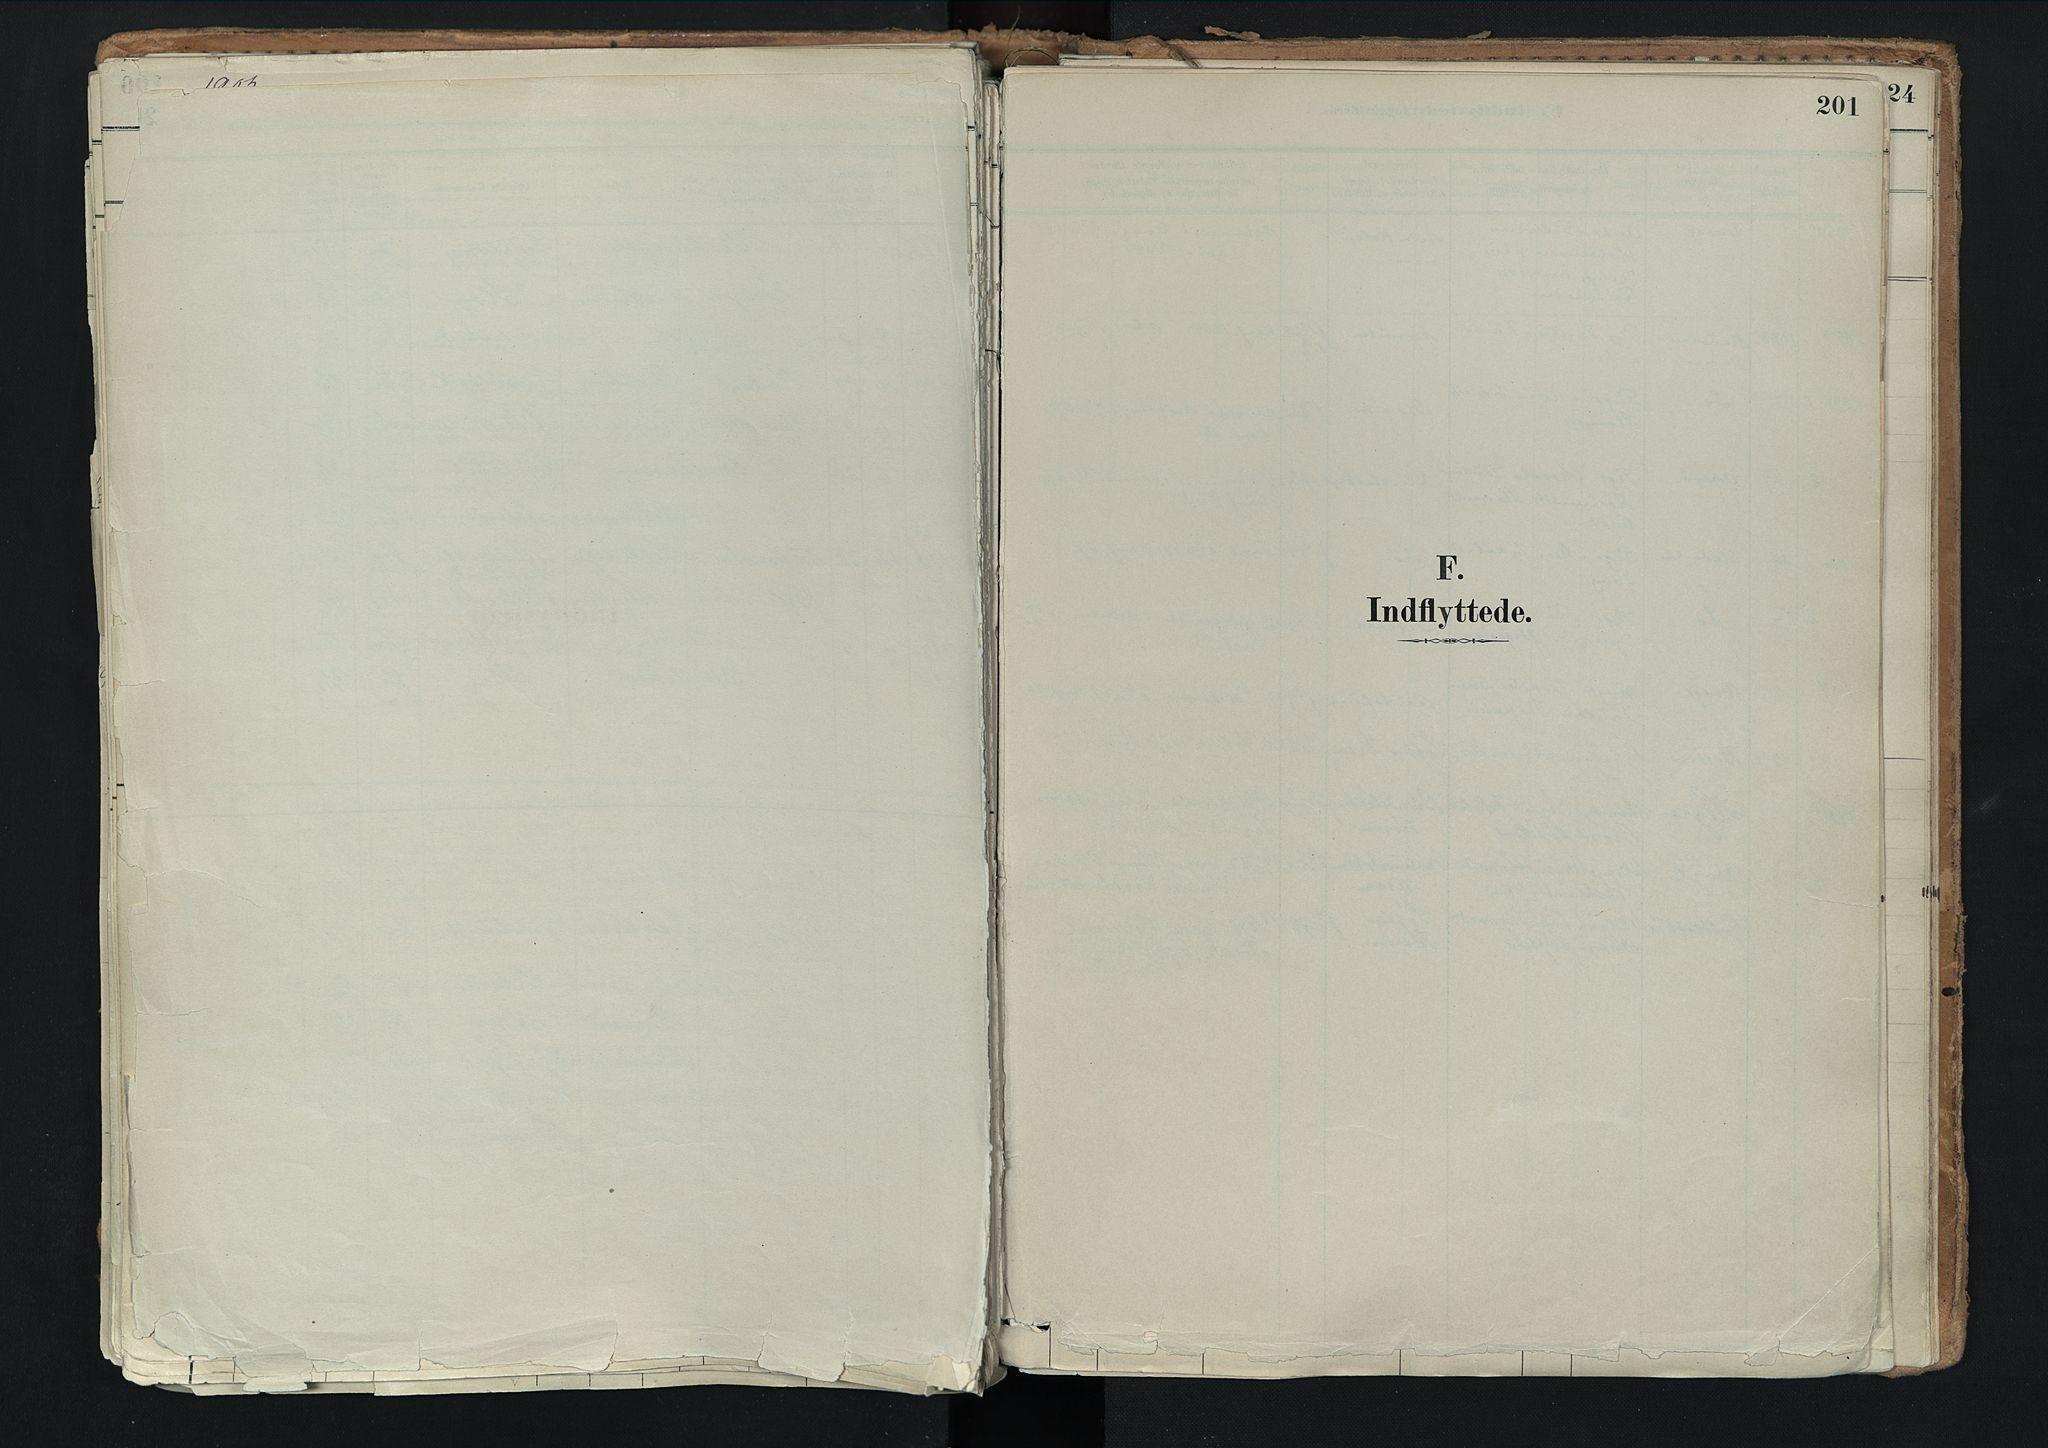 SAH, Nord-Fron prestekontor, Ministerialbok nr. 3, 1884-1914, s. 201